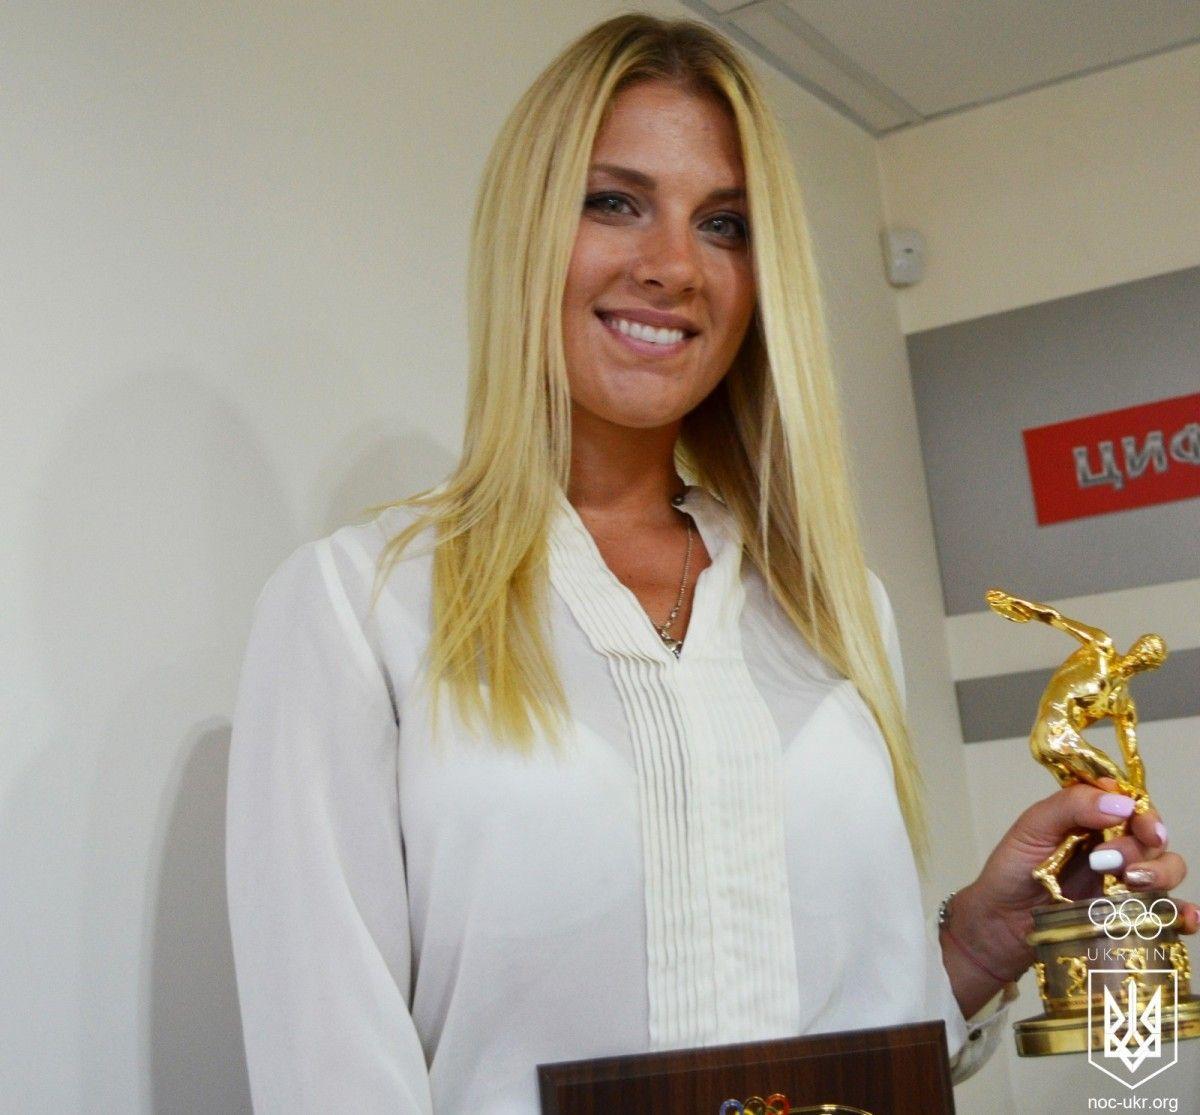 Харлан получила юбилейную награду от НОК / noc-ukr.org